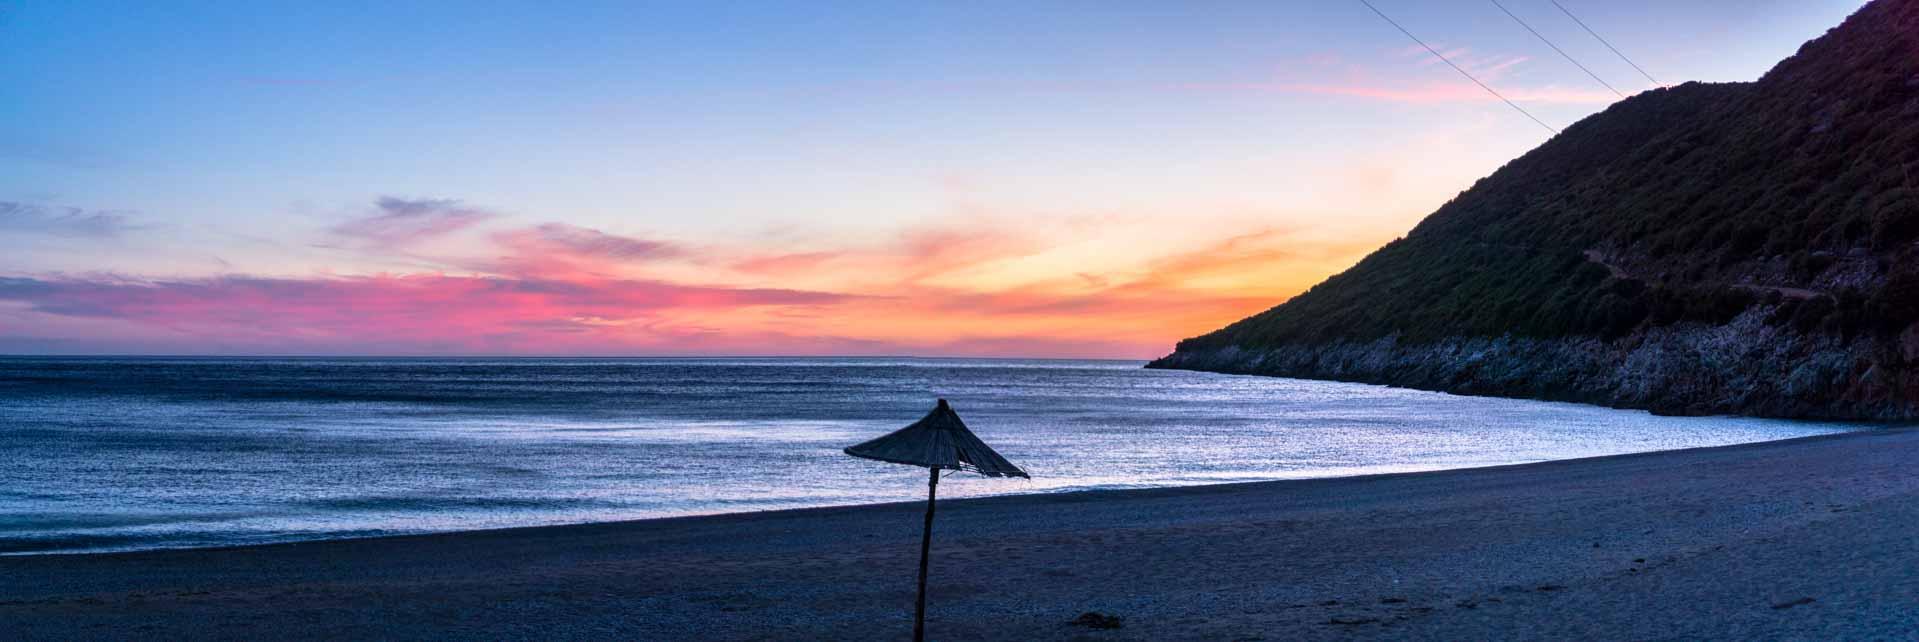 Jul&Gaux SerialHikers autostop hitchhiking aventure adventure alternative travel voyage volontariat volonteering gjipe albania cove crique beach